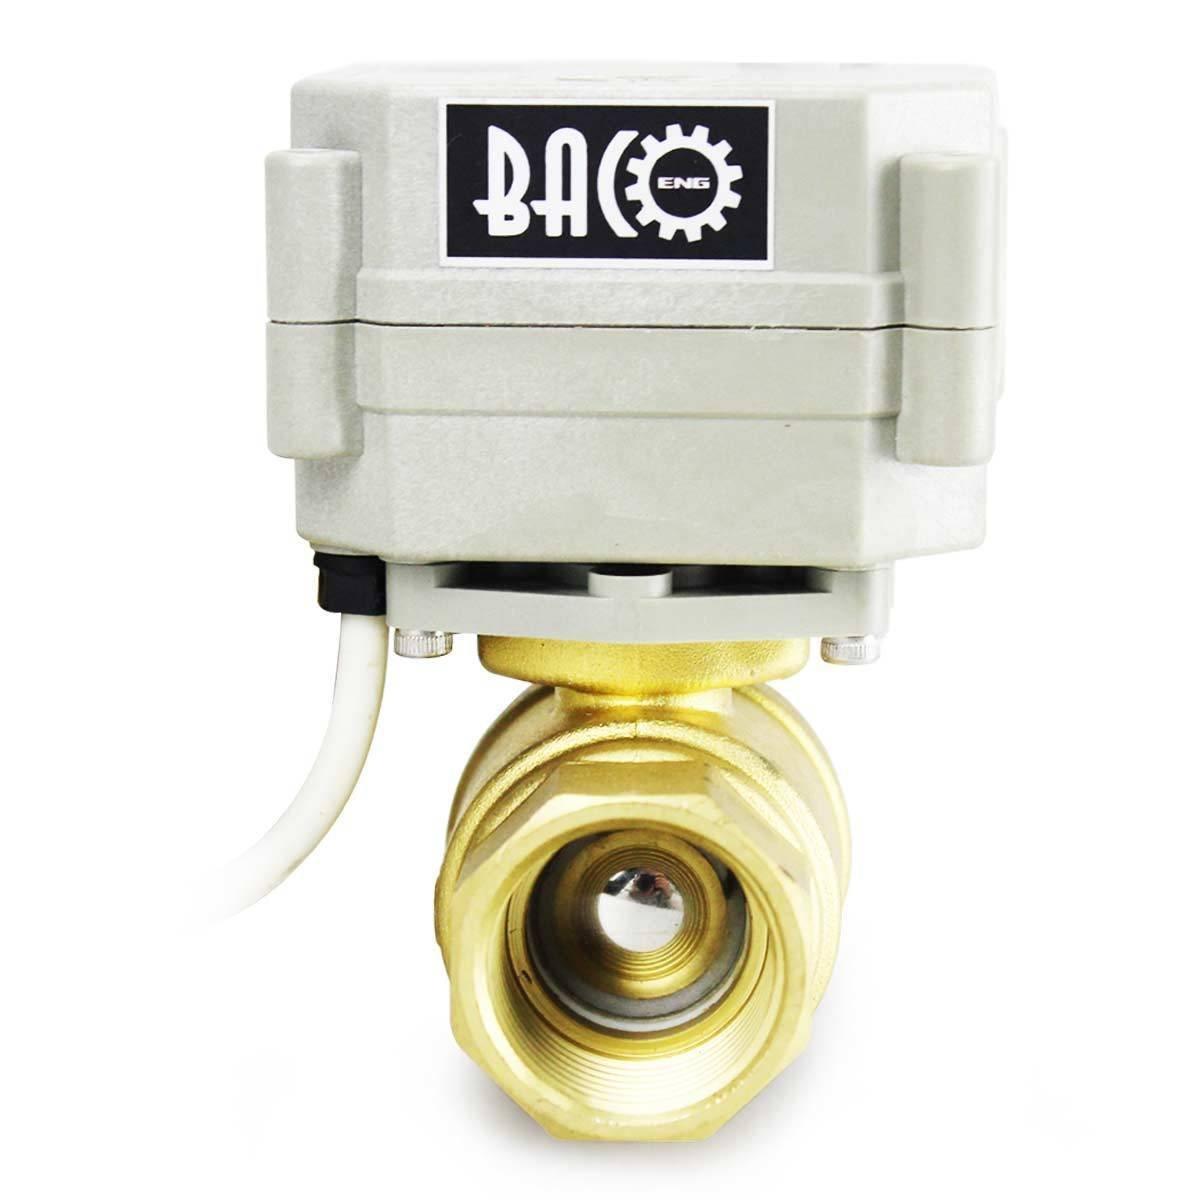 BACOENG AC110-230V 2 Wege 3//4 Messing CR502 Motorkugelhahn Elektrische Zonenventil